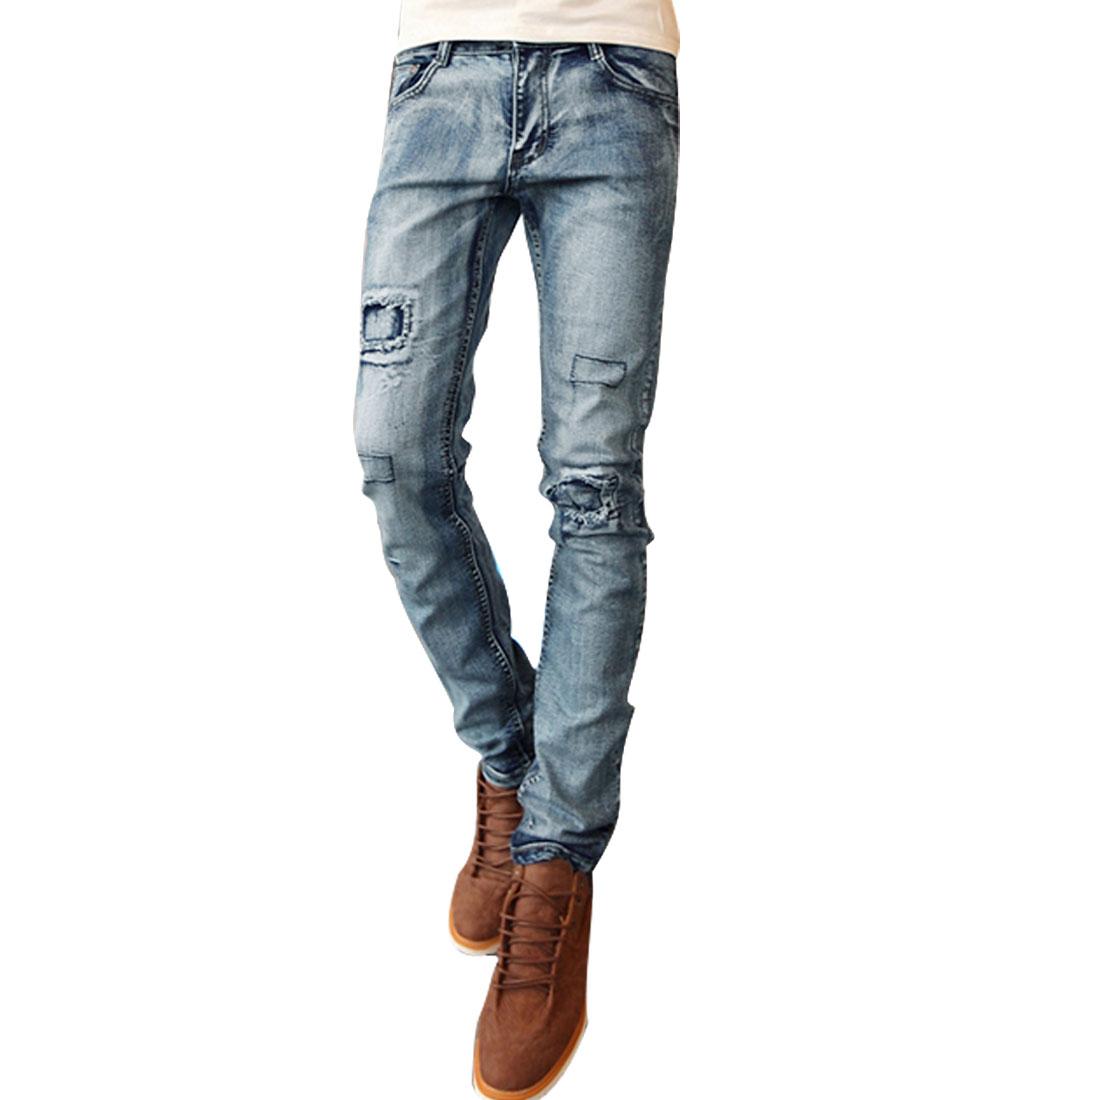 Men Belt Loops Zip Fly Button Closure Back Pockets Slim Fit Jeans Blue W32